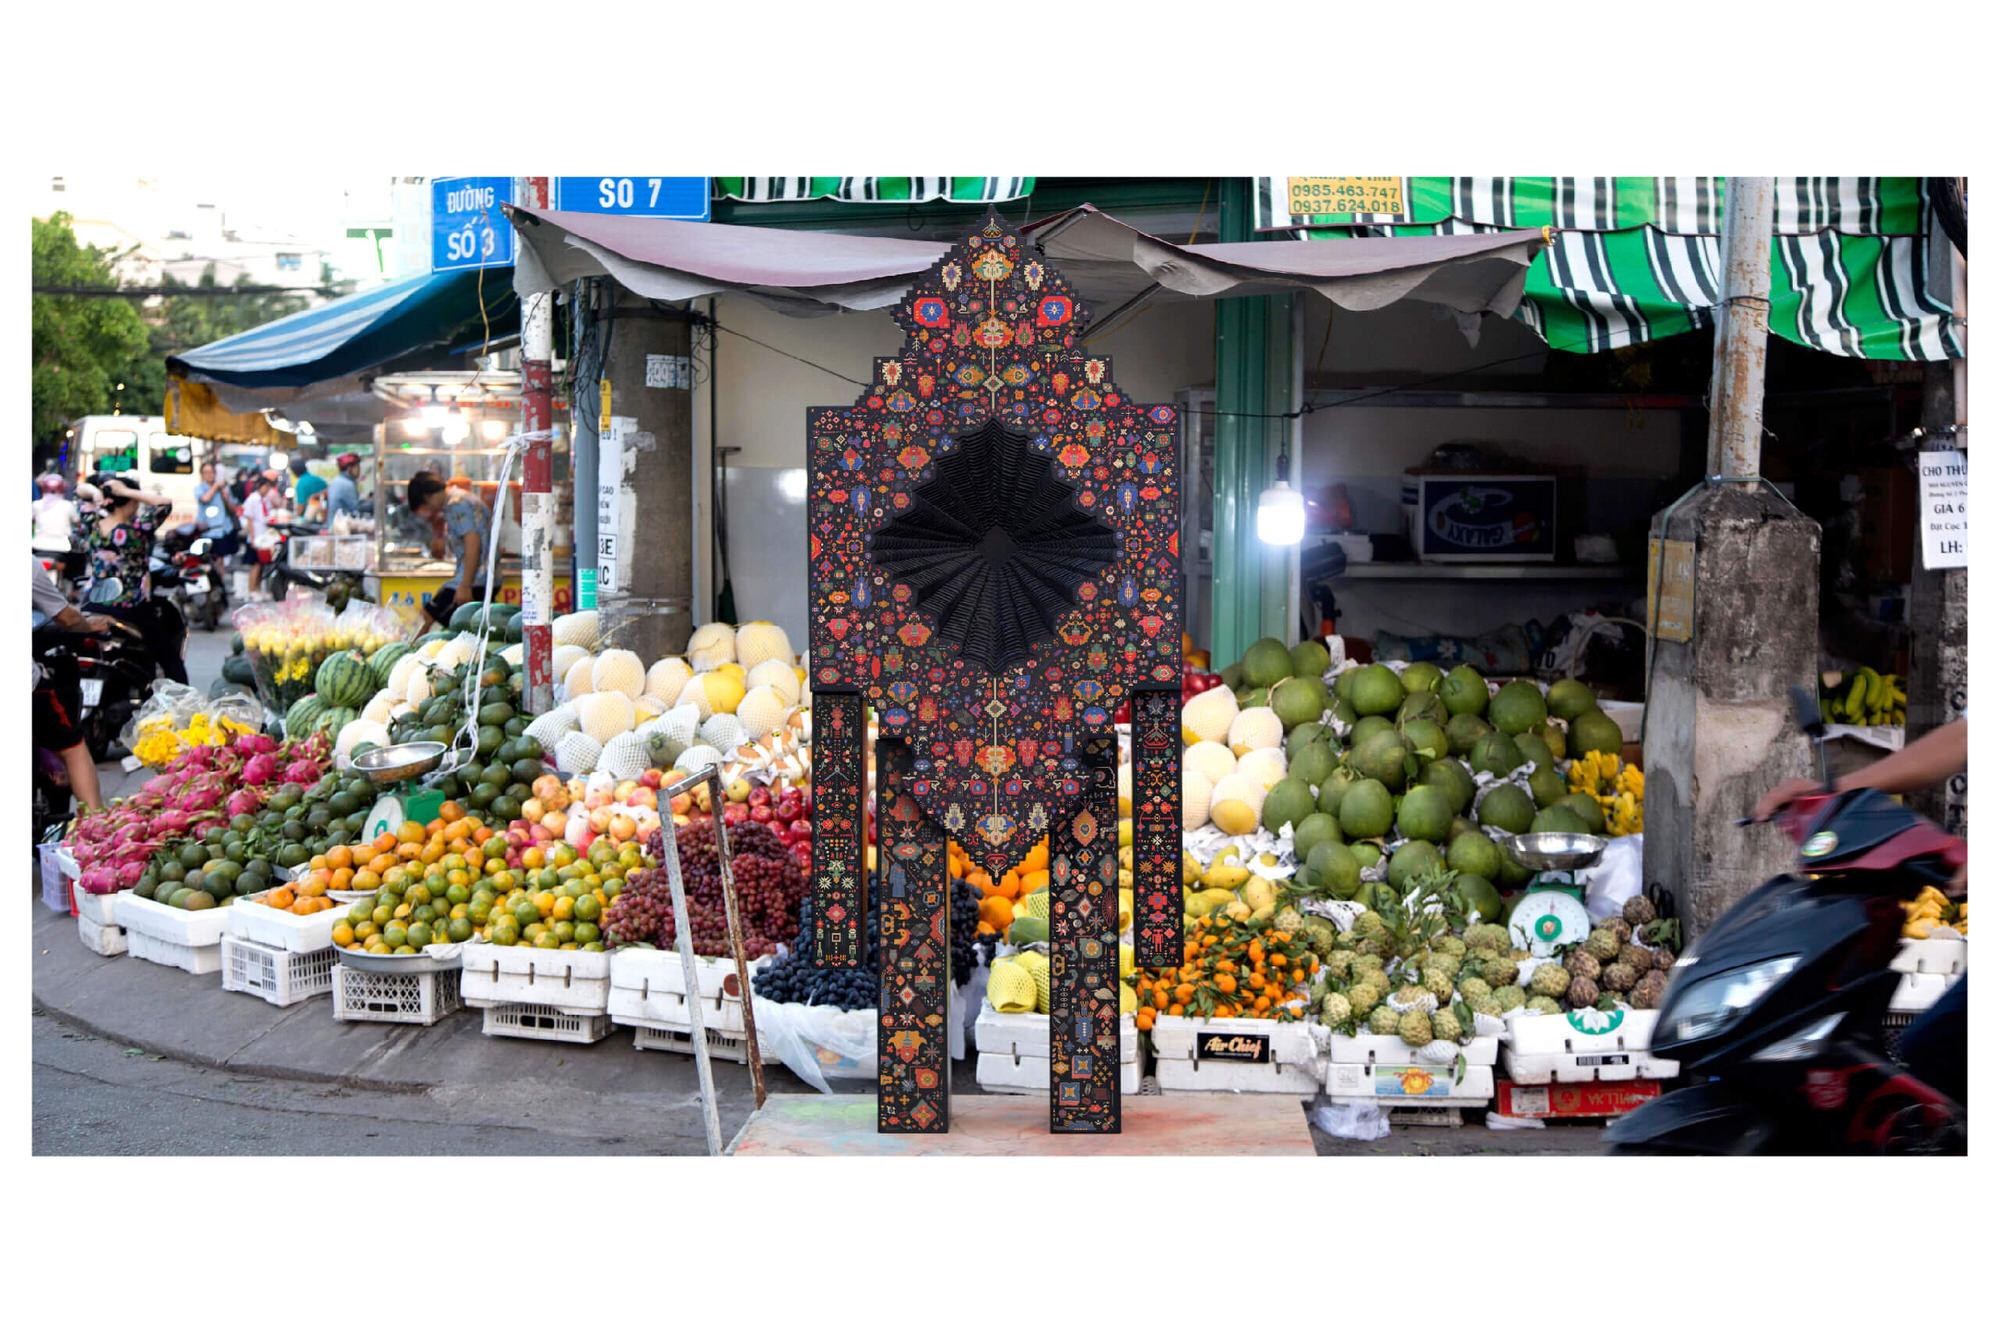 Ravana, Design By Reborn, Persian Carpet Reincarnation in Saigon | Yellowtrace